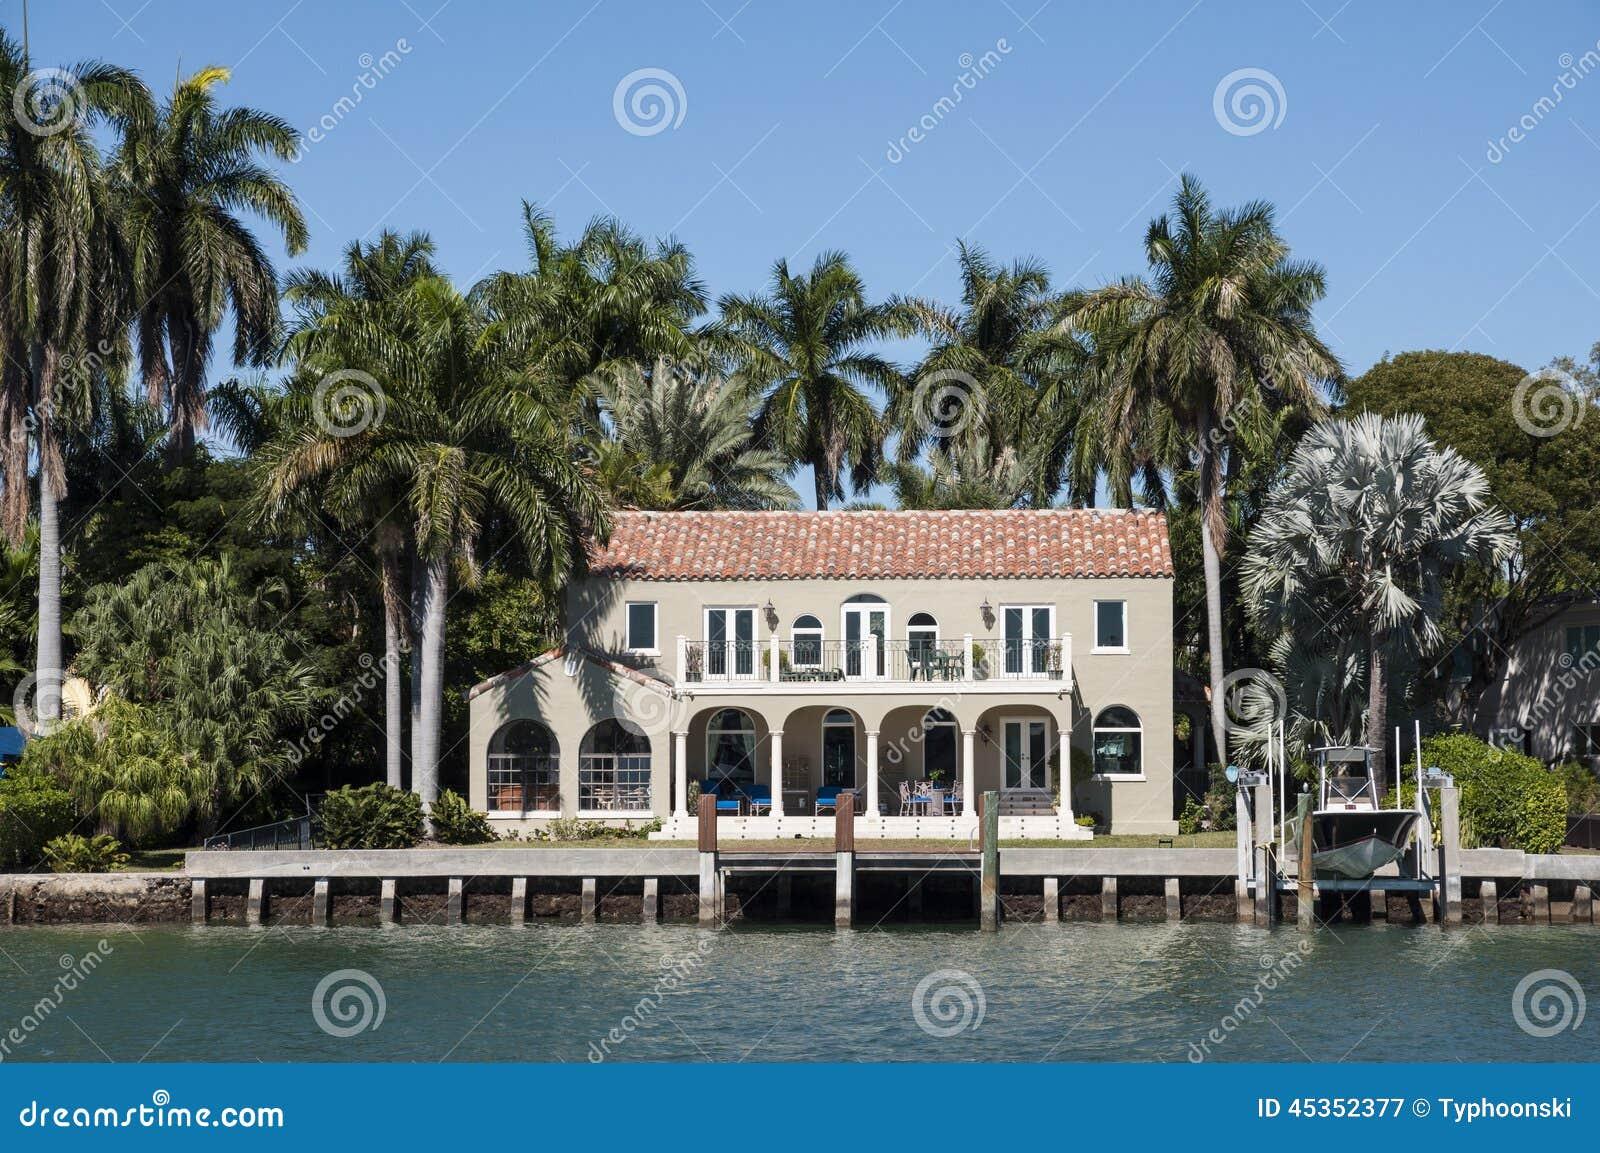 Maison de luxe de bord de mer à Miami